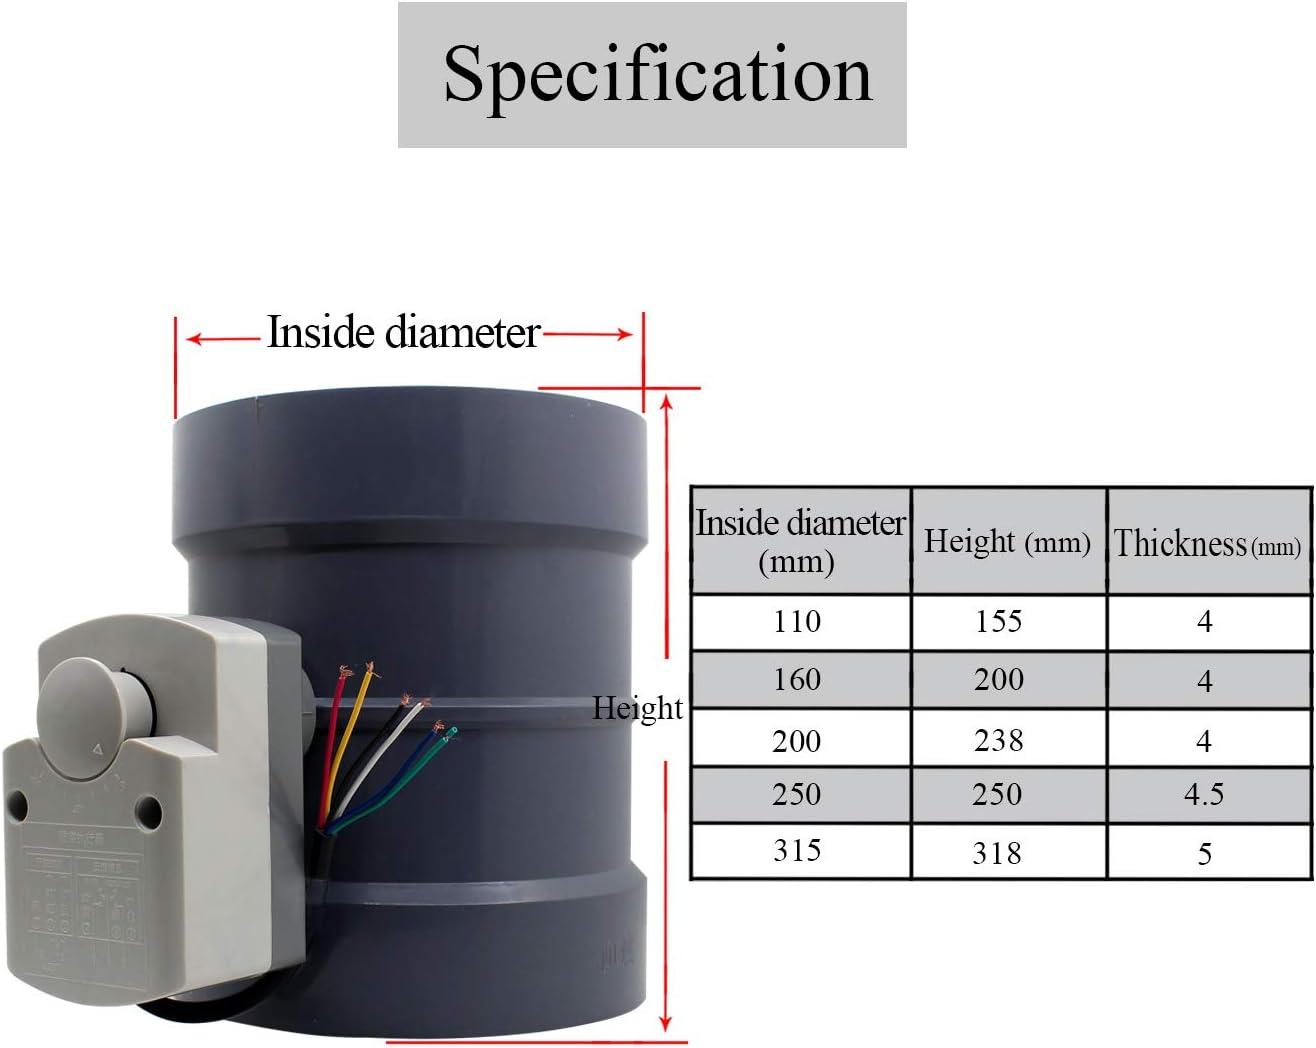 H/öhe 190mm + Au/ßendurchmesser 200mm 1 St/ück 220v HVAC absperrklappe elektrisch drosselklappe l/üftung l/üftungsklappe elektrisch Durchmesser 80 100 125 150 200 250 300 250 400 mm